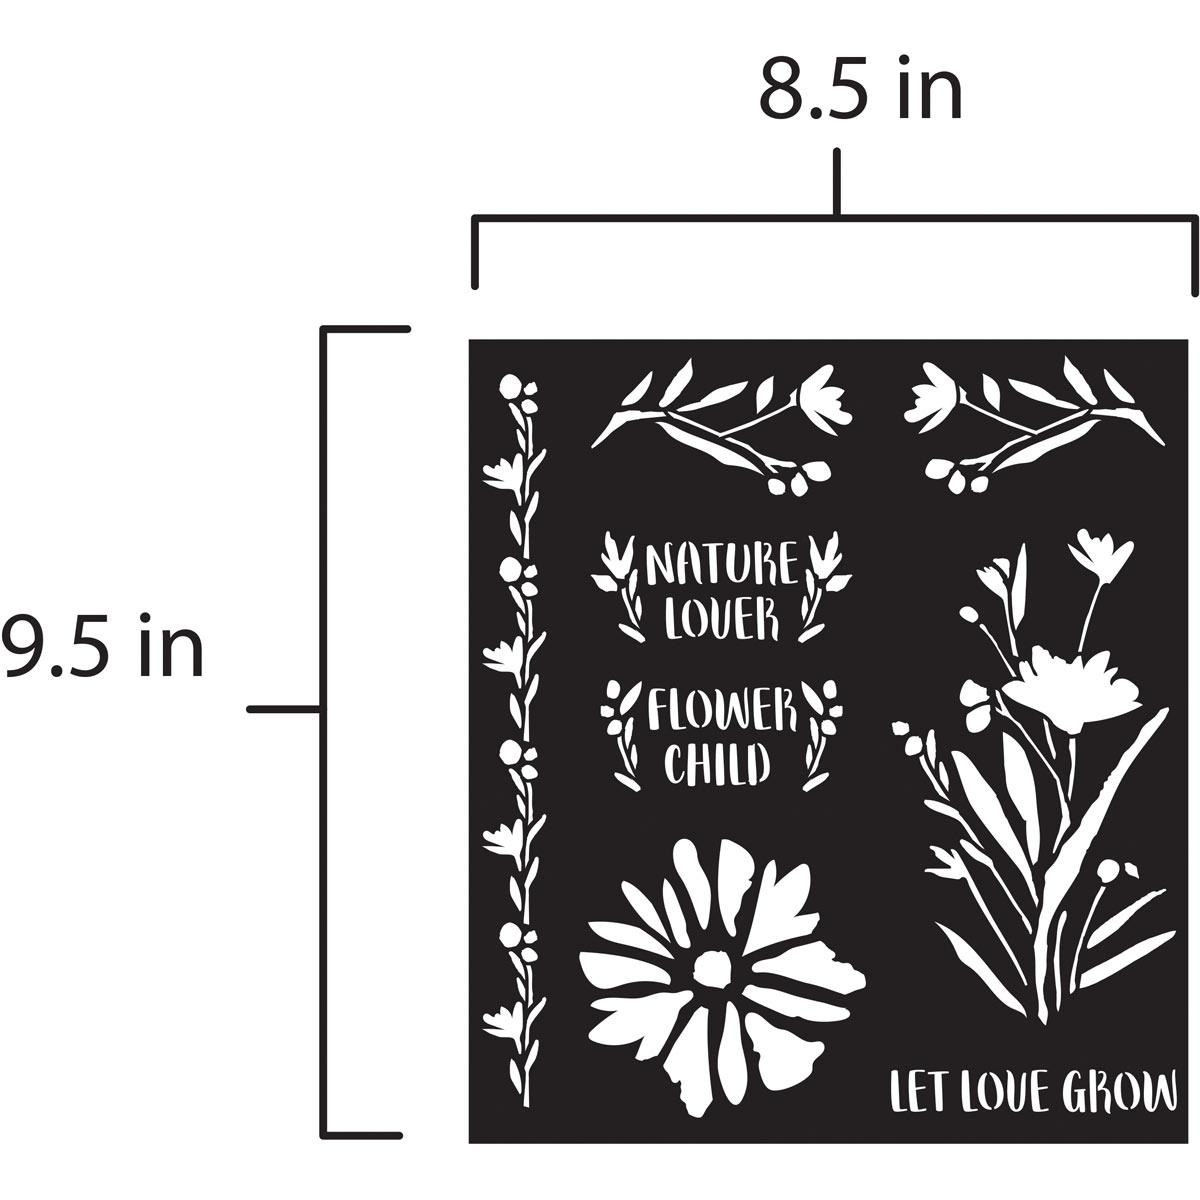 FolkArt ® Laser Cut Adhesive Stencils - Wildflowers